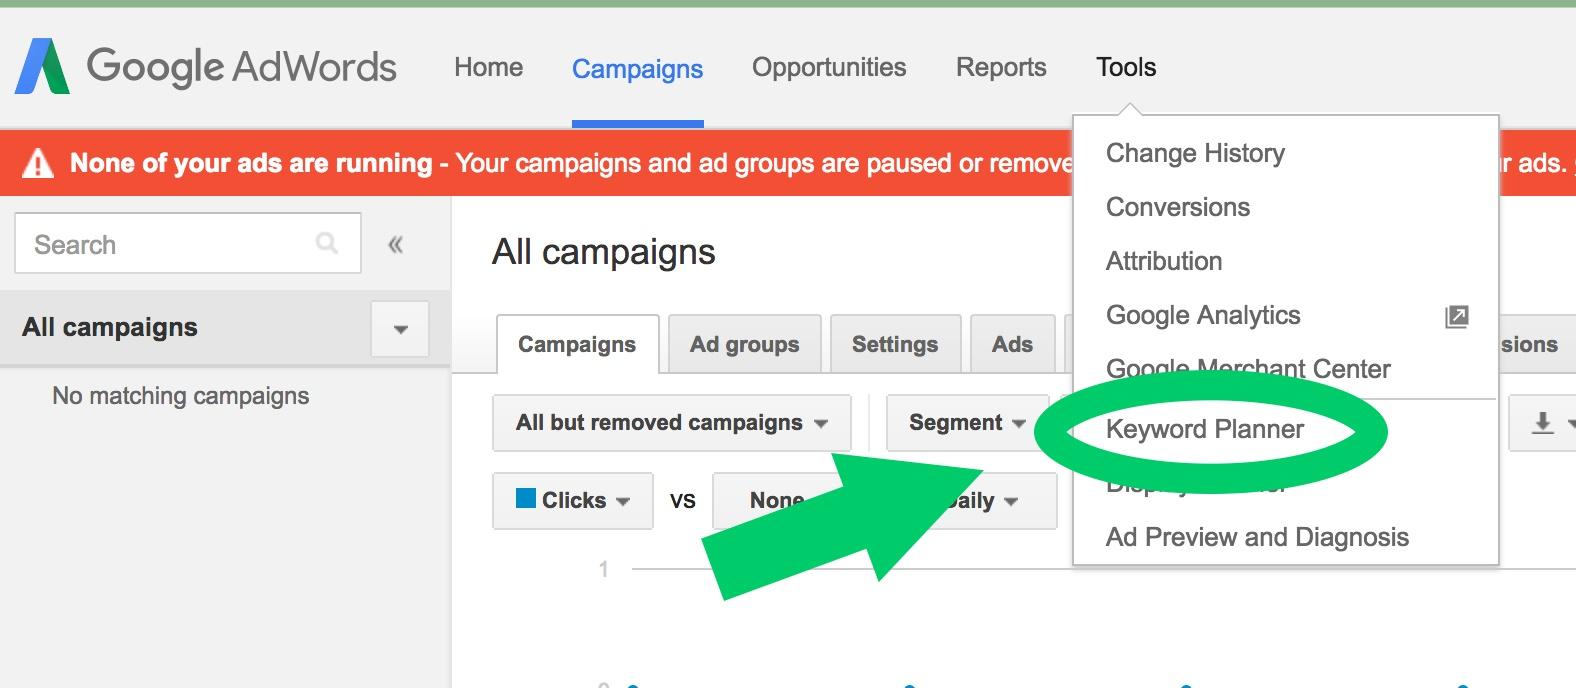 content-marketing-strategy-google-adwords-keyword-planner.jpg